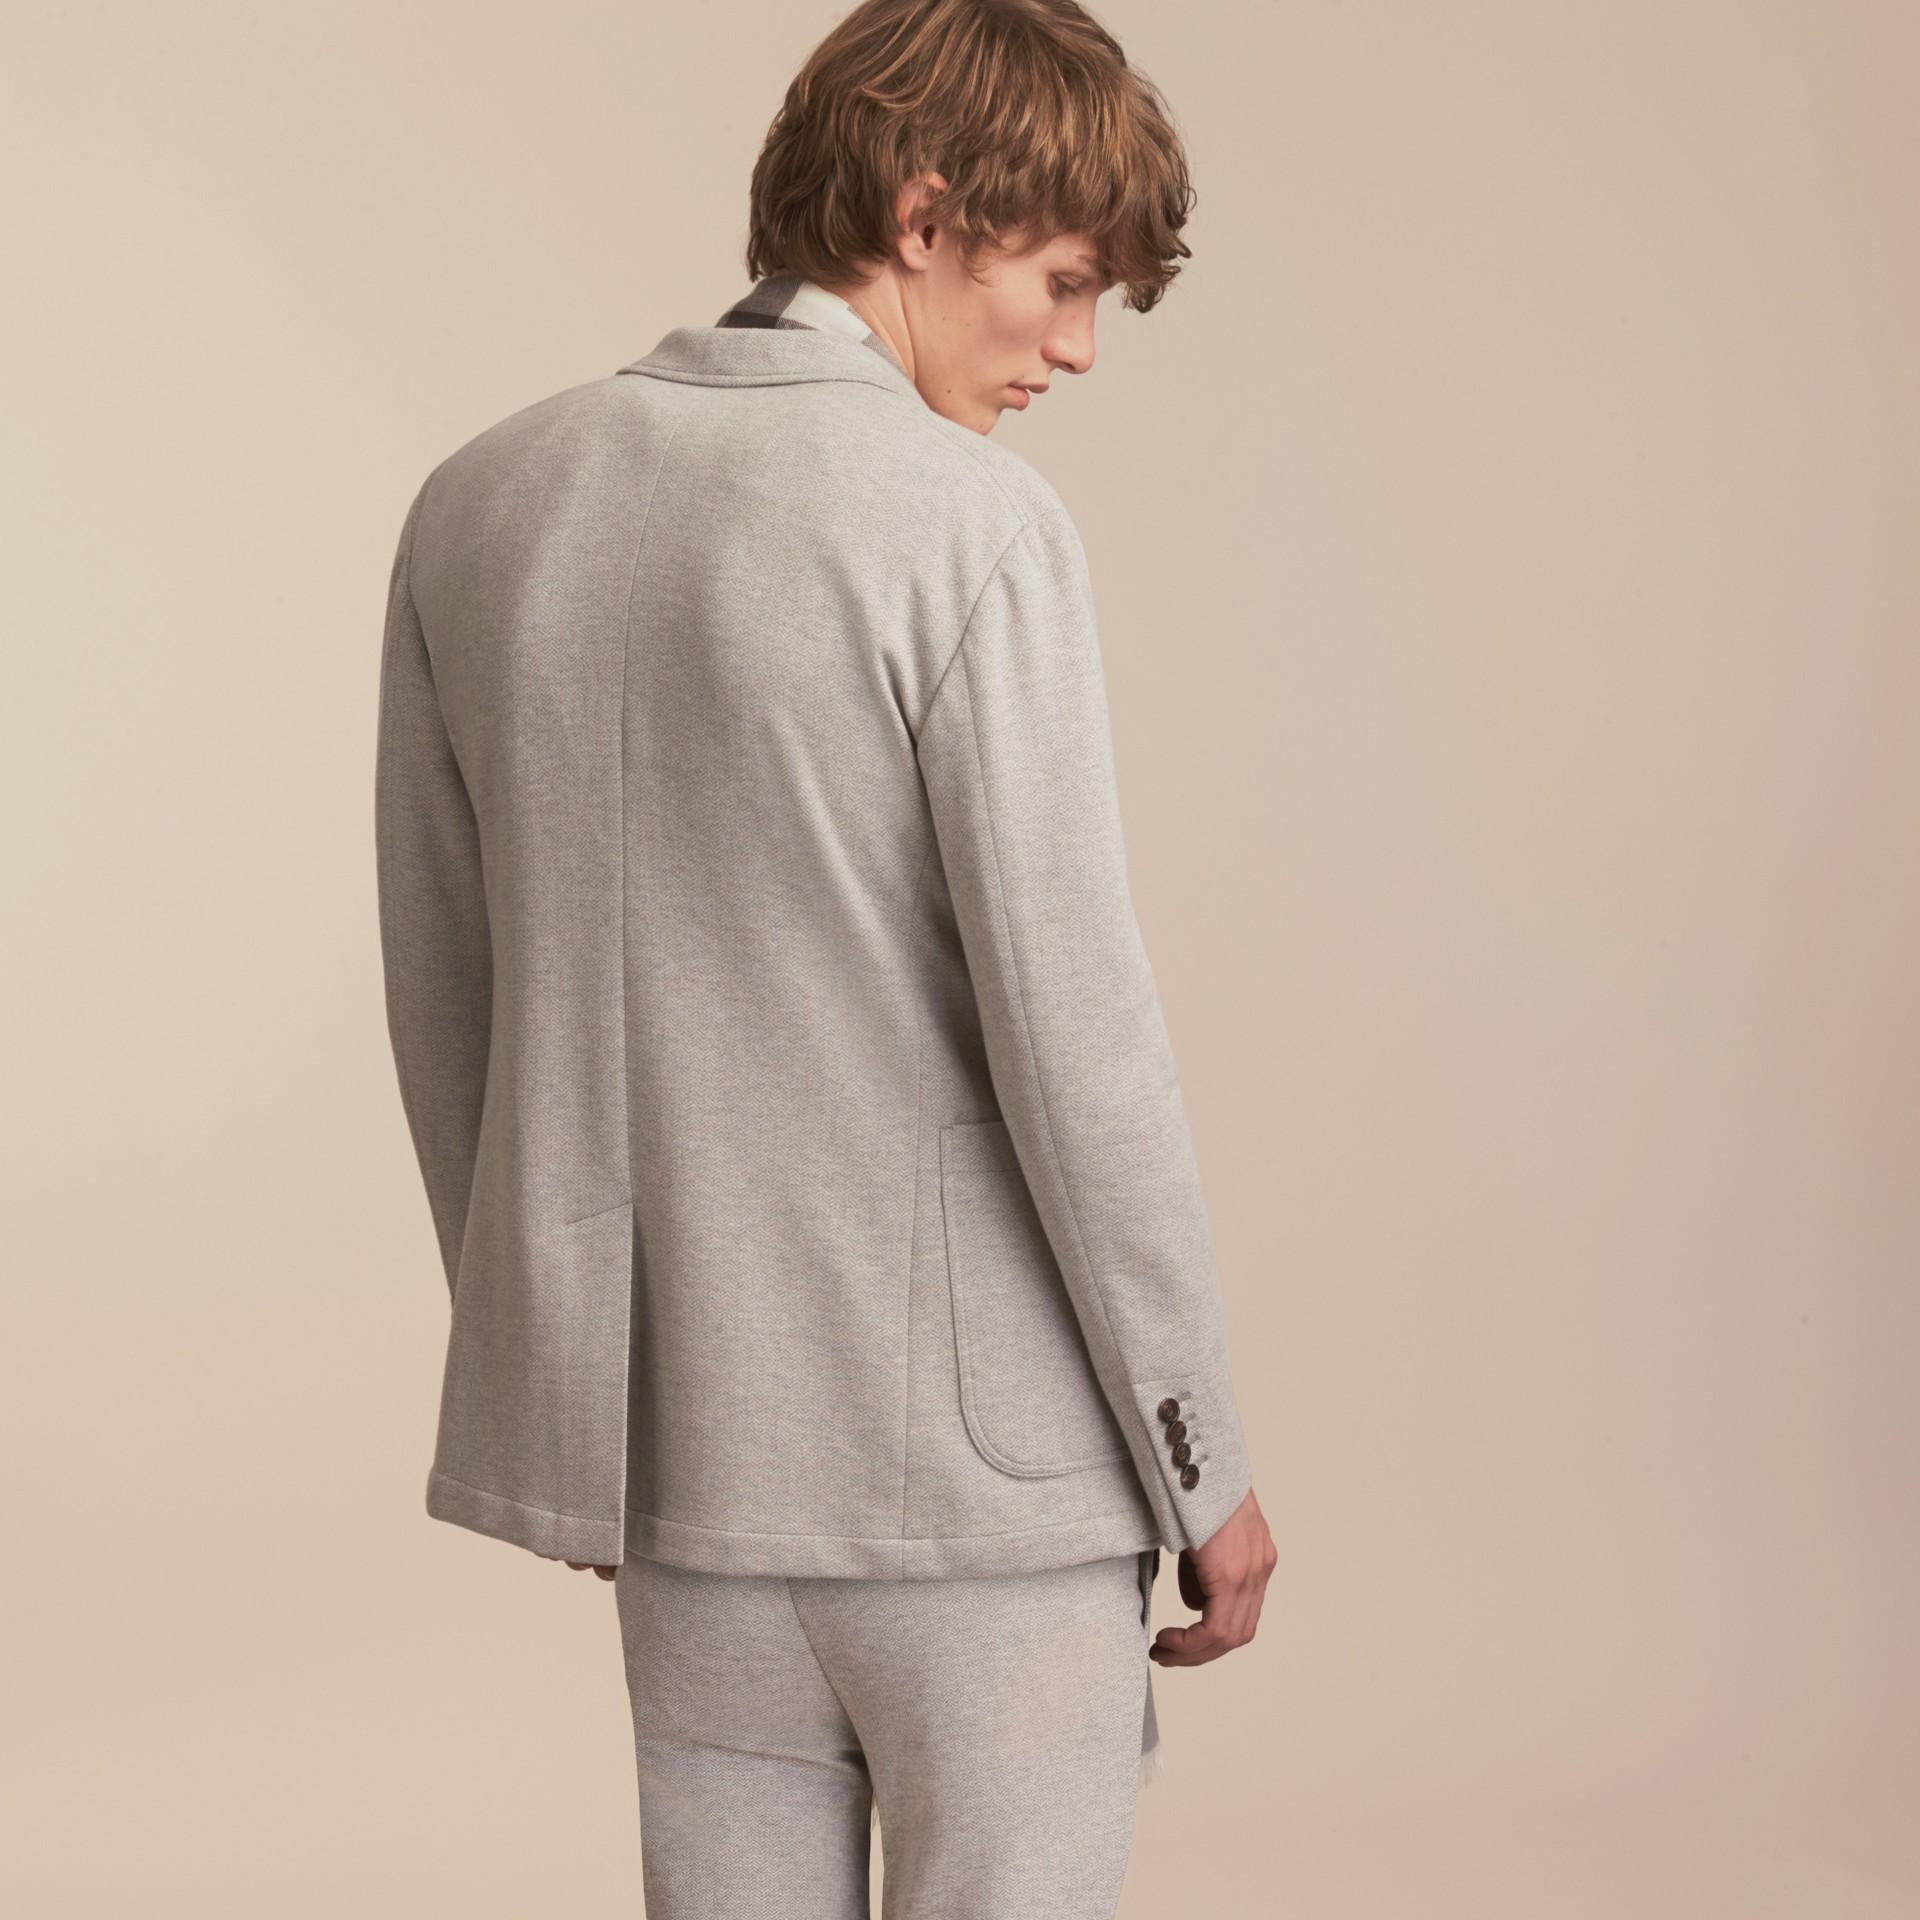 Herringbone Cotton Blend Jersey Blazer - gallery image 3